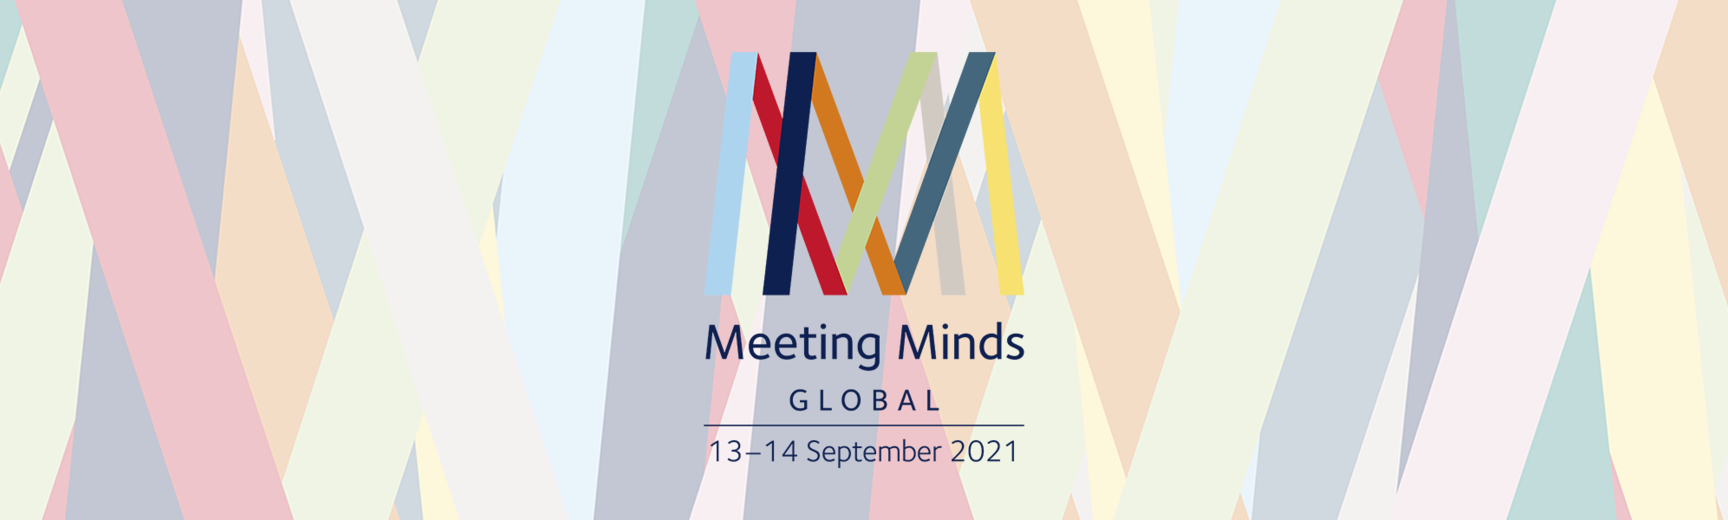 Meeting Minds Global: 13-14 September 2021